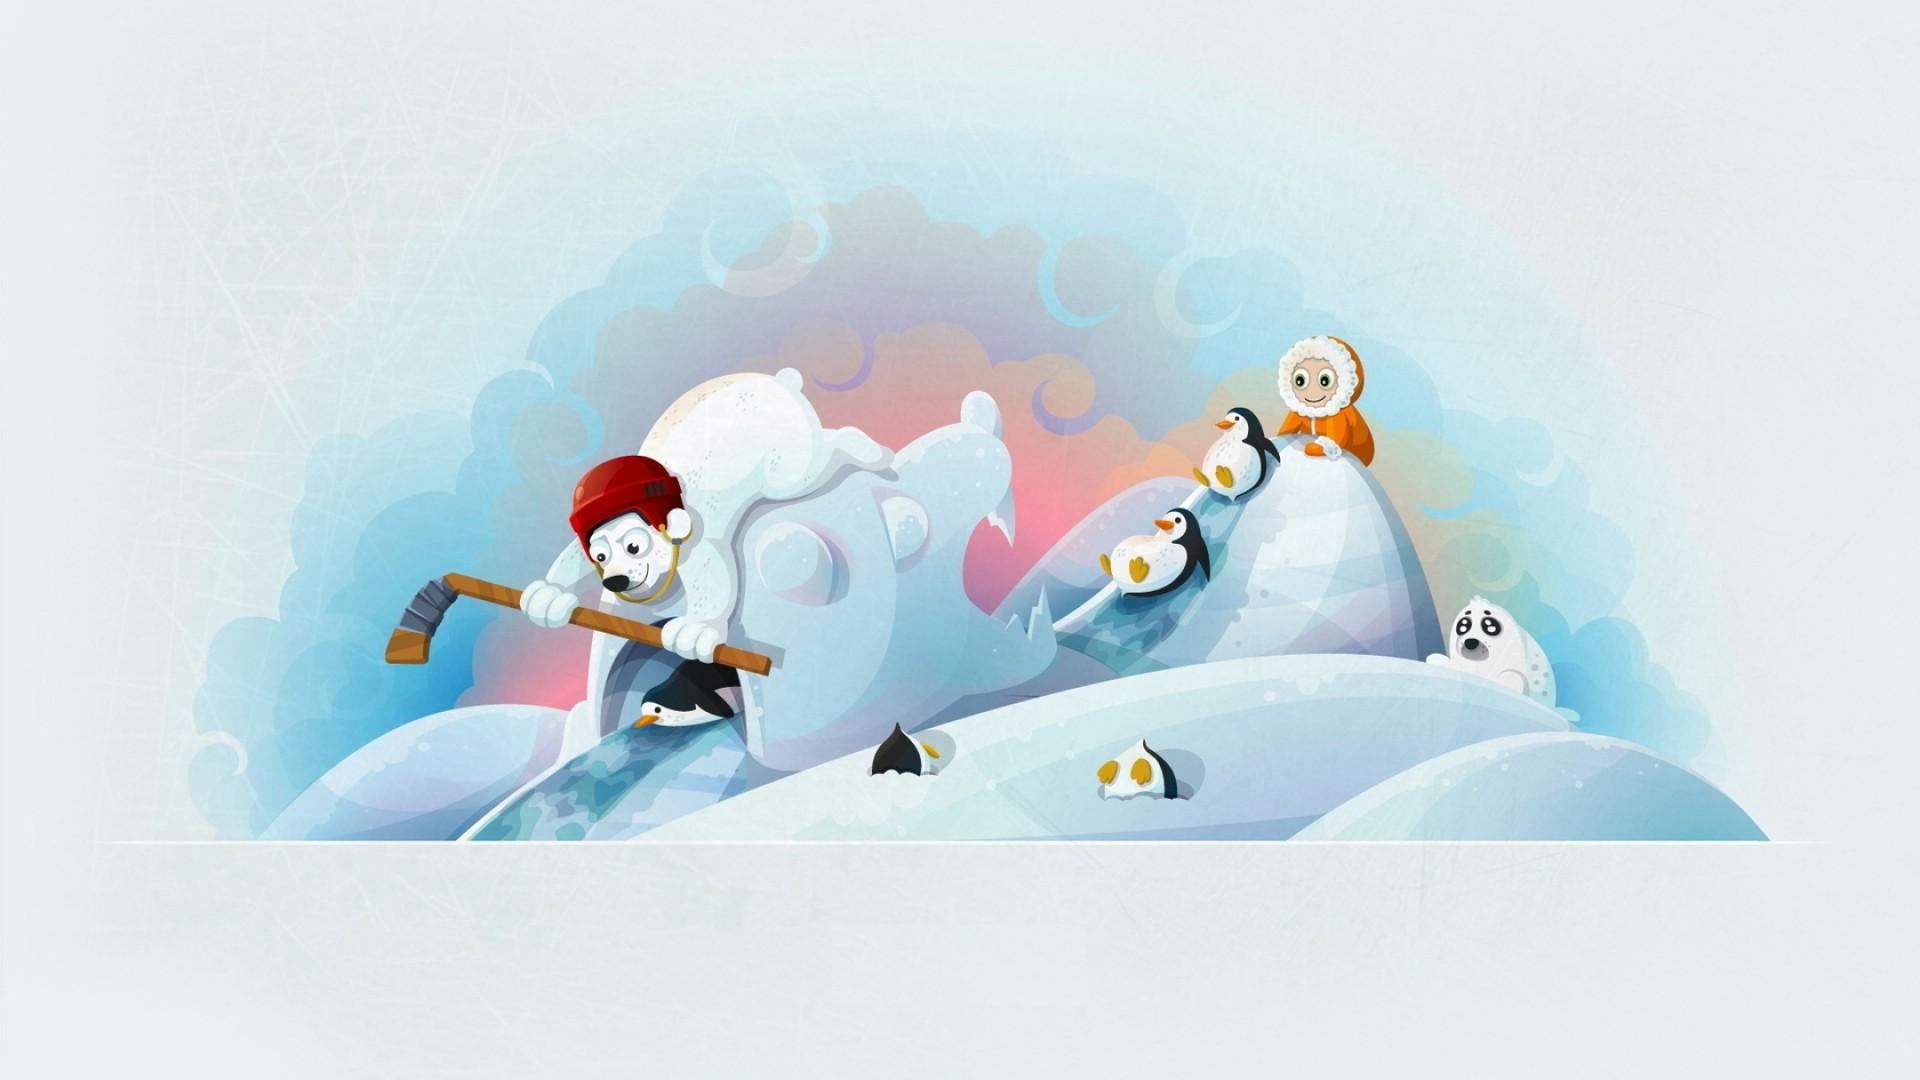 Wallpaper winter, bears, hockey, hockey stick, baby, penguin, fun